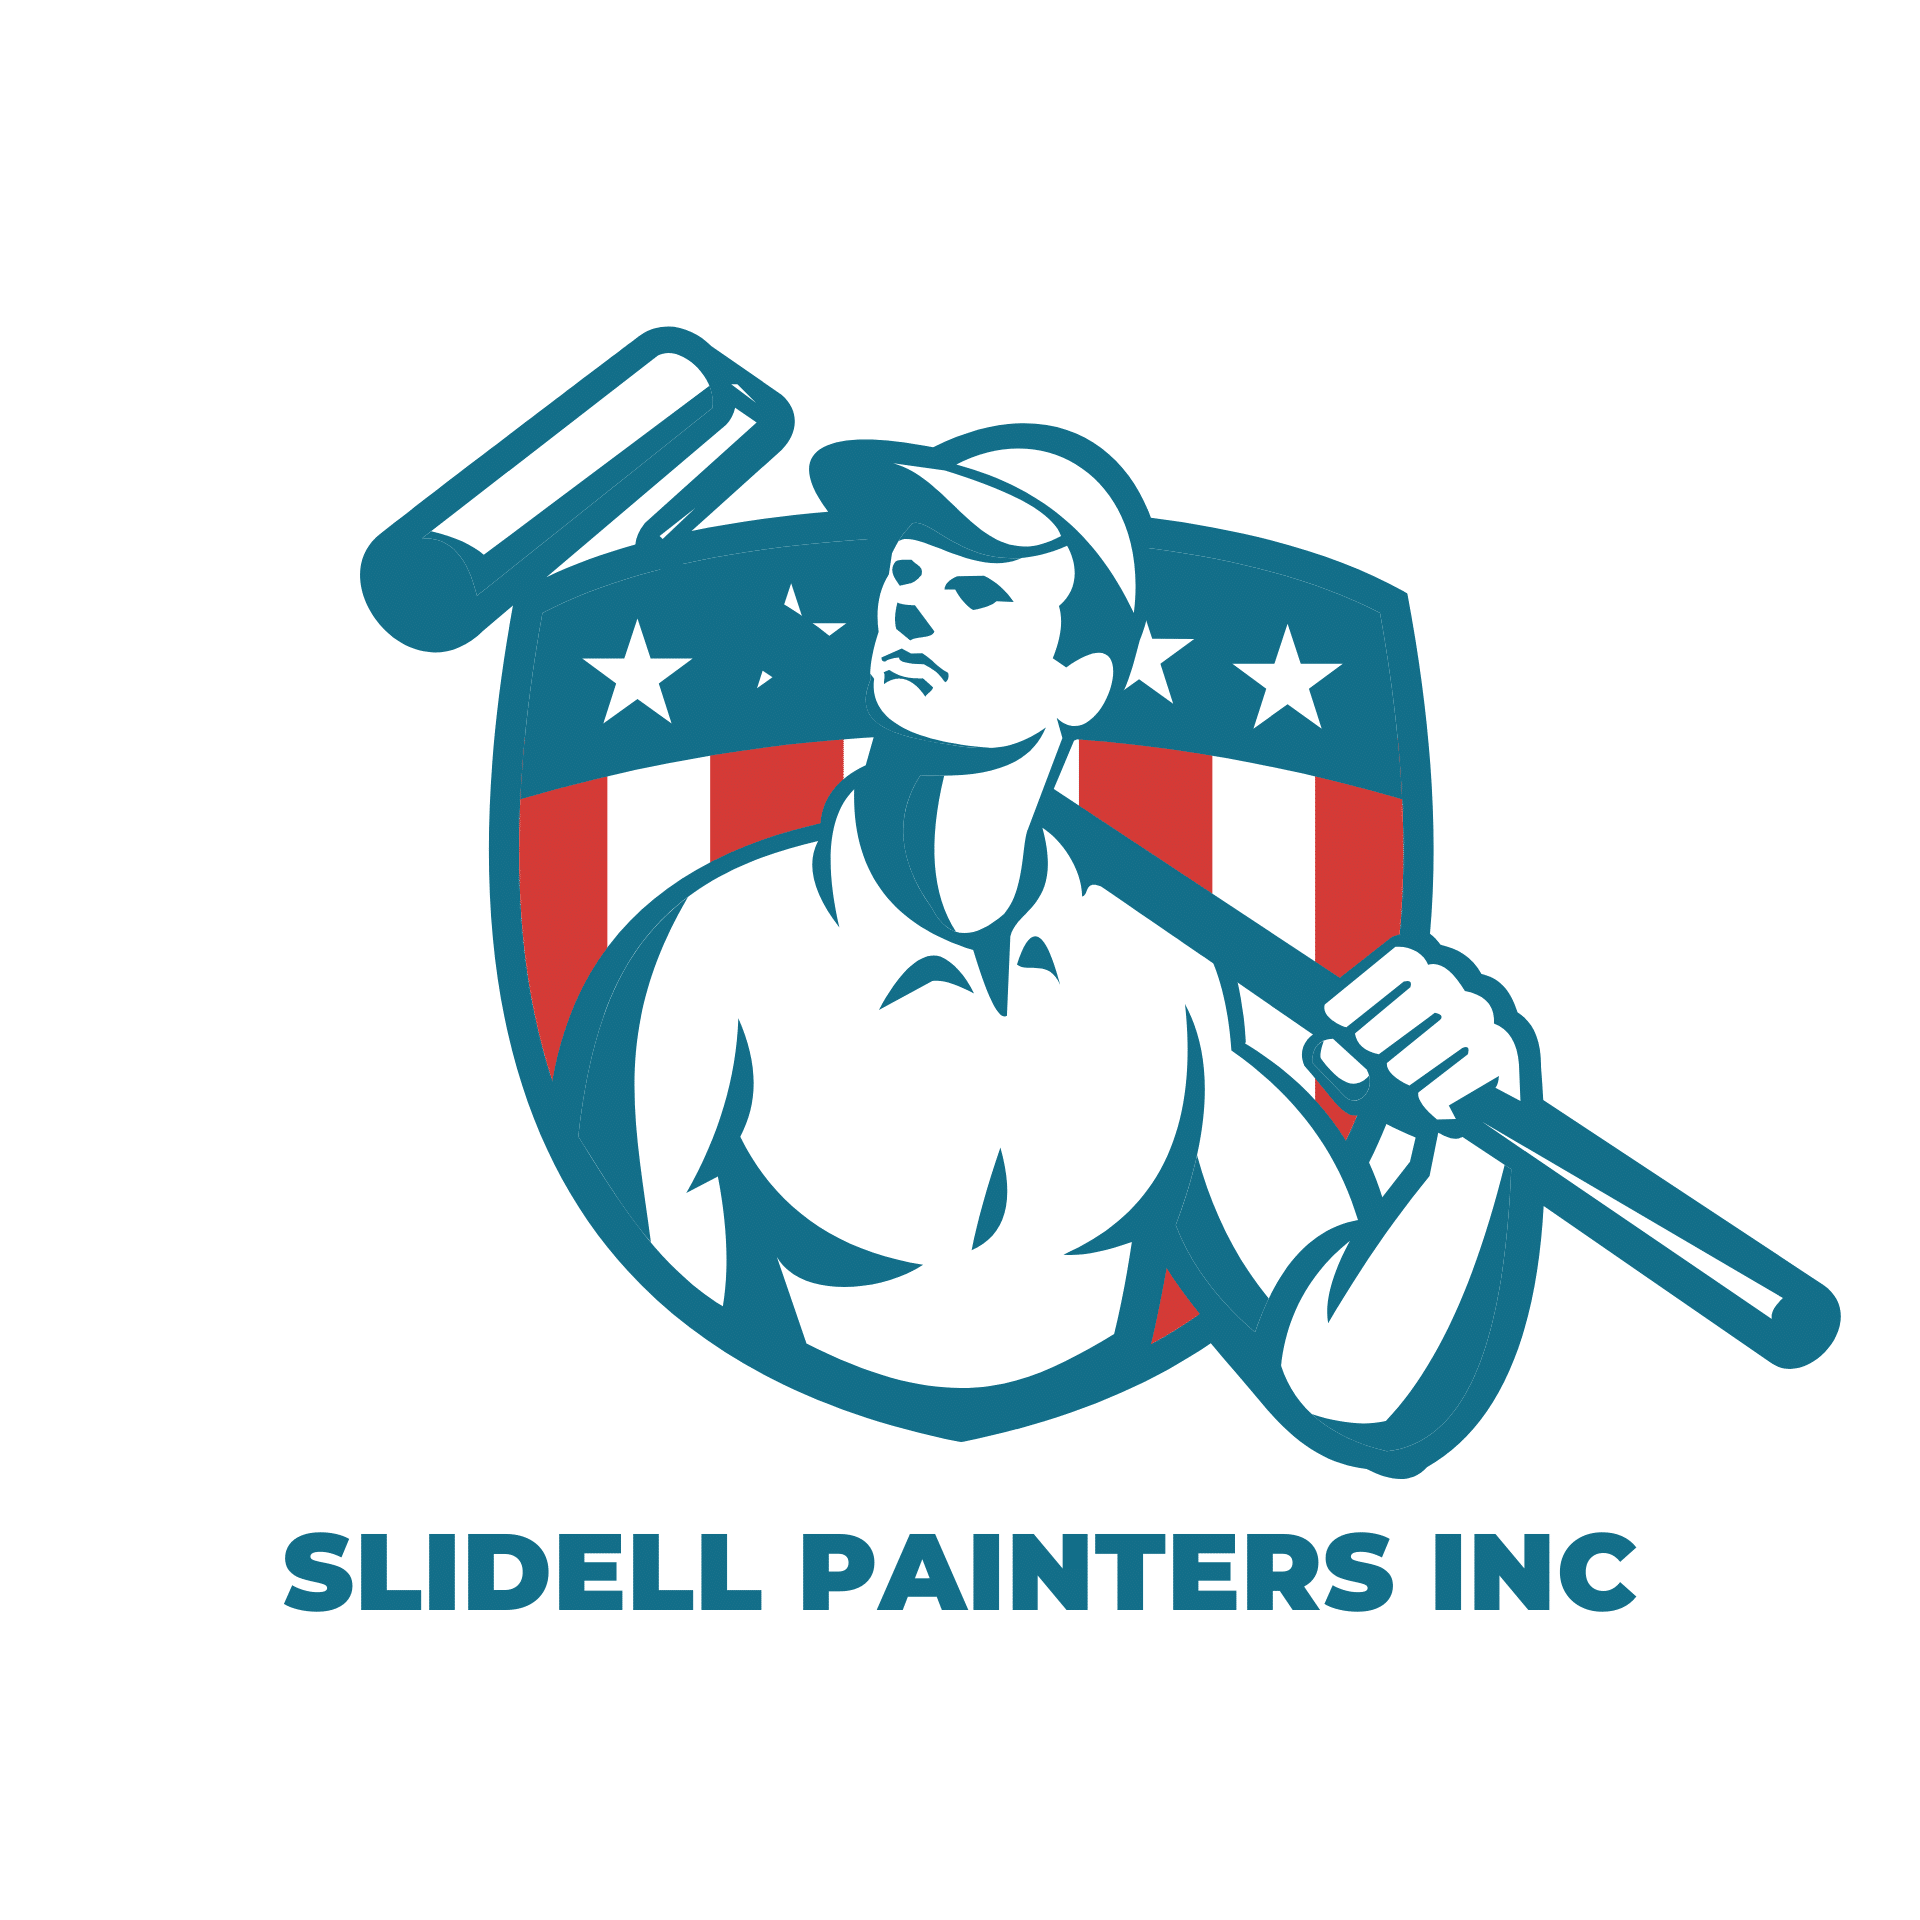 Slidell Painters